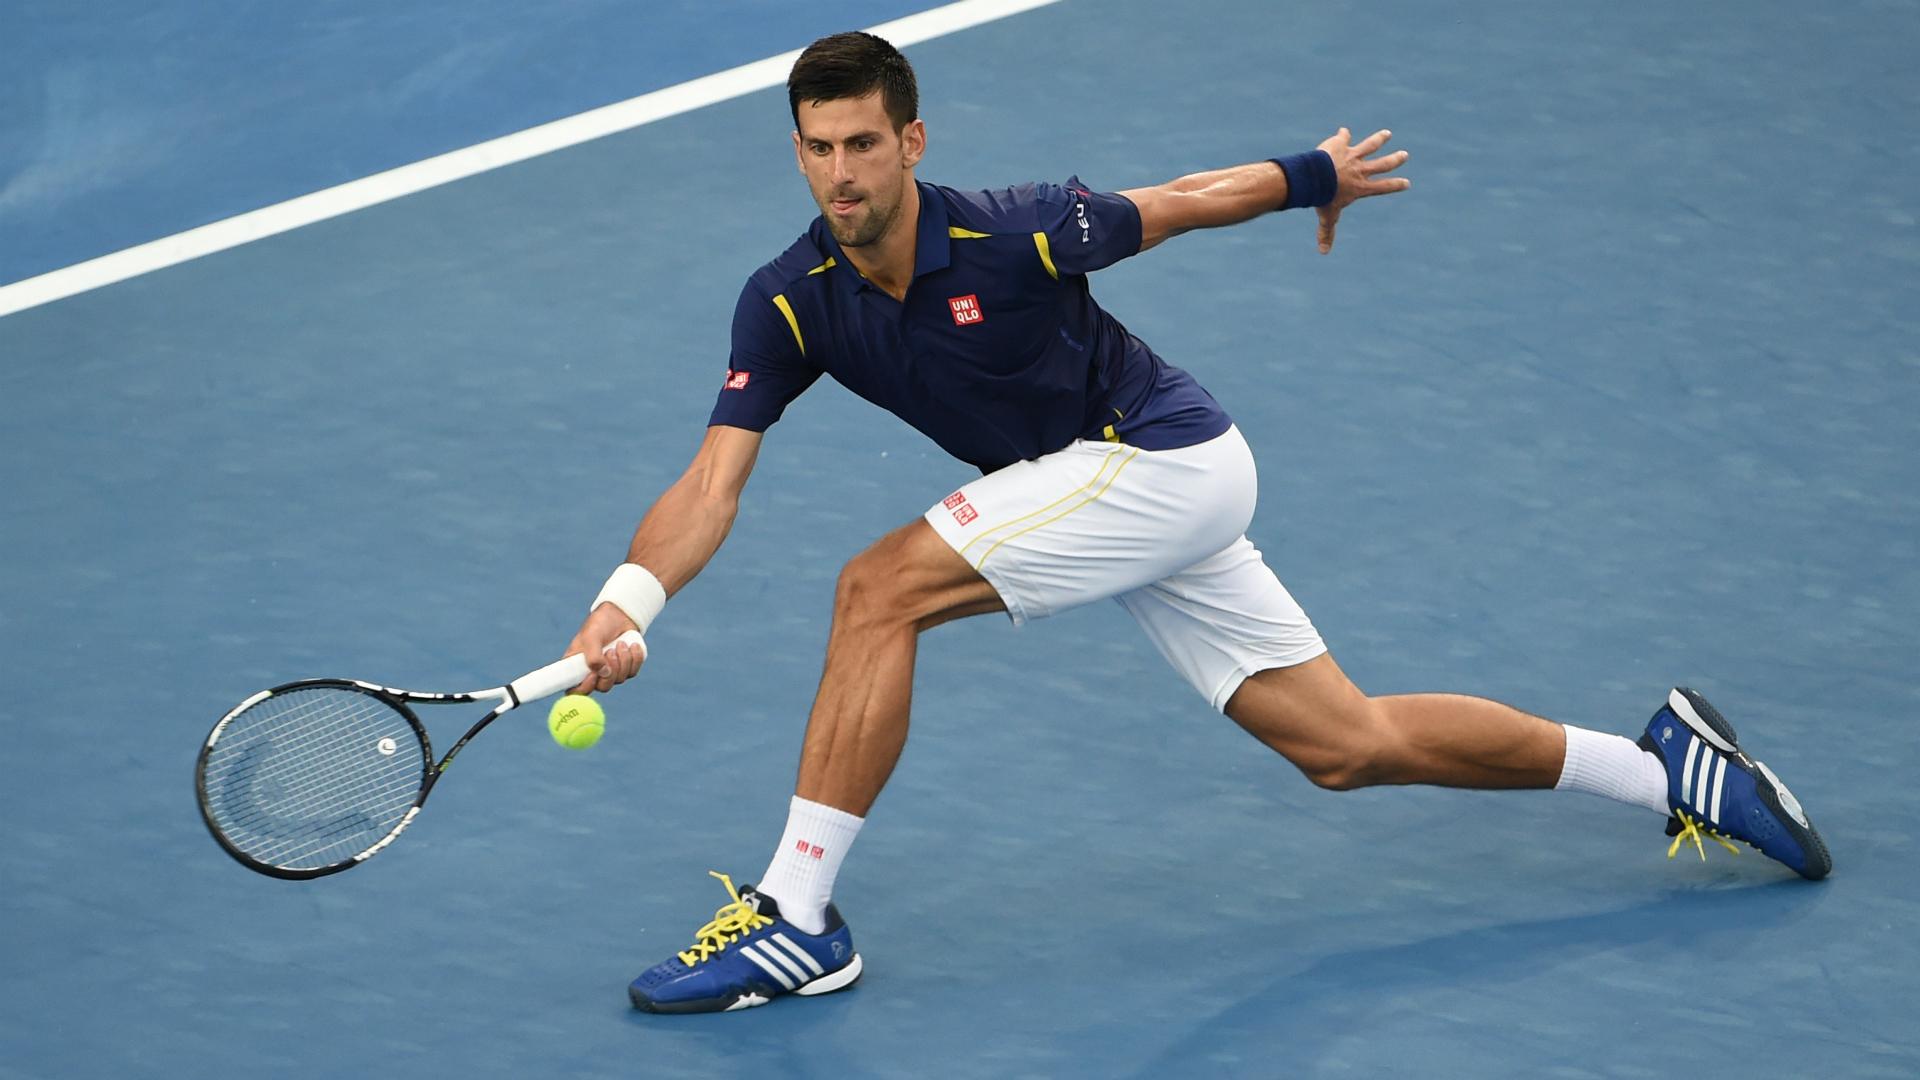 Australian Open 2019 Mens Futures: Can Djokovic Extend His Dominance?